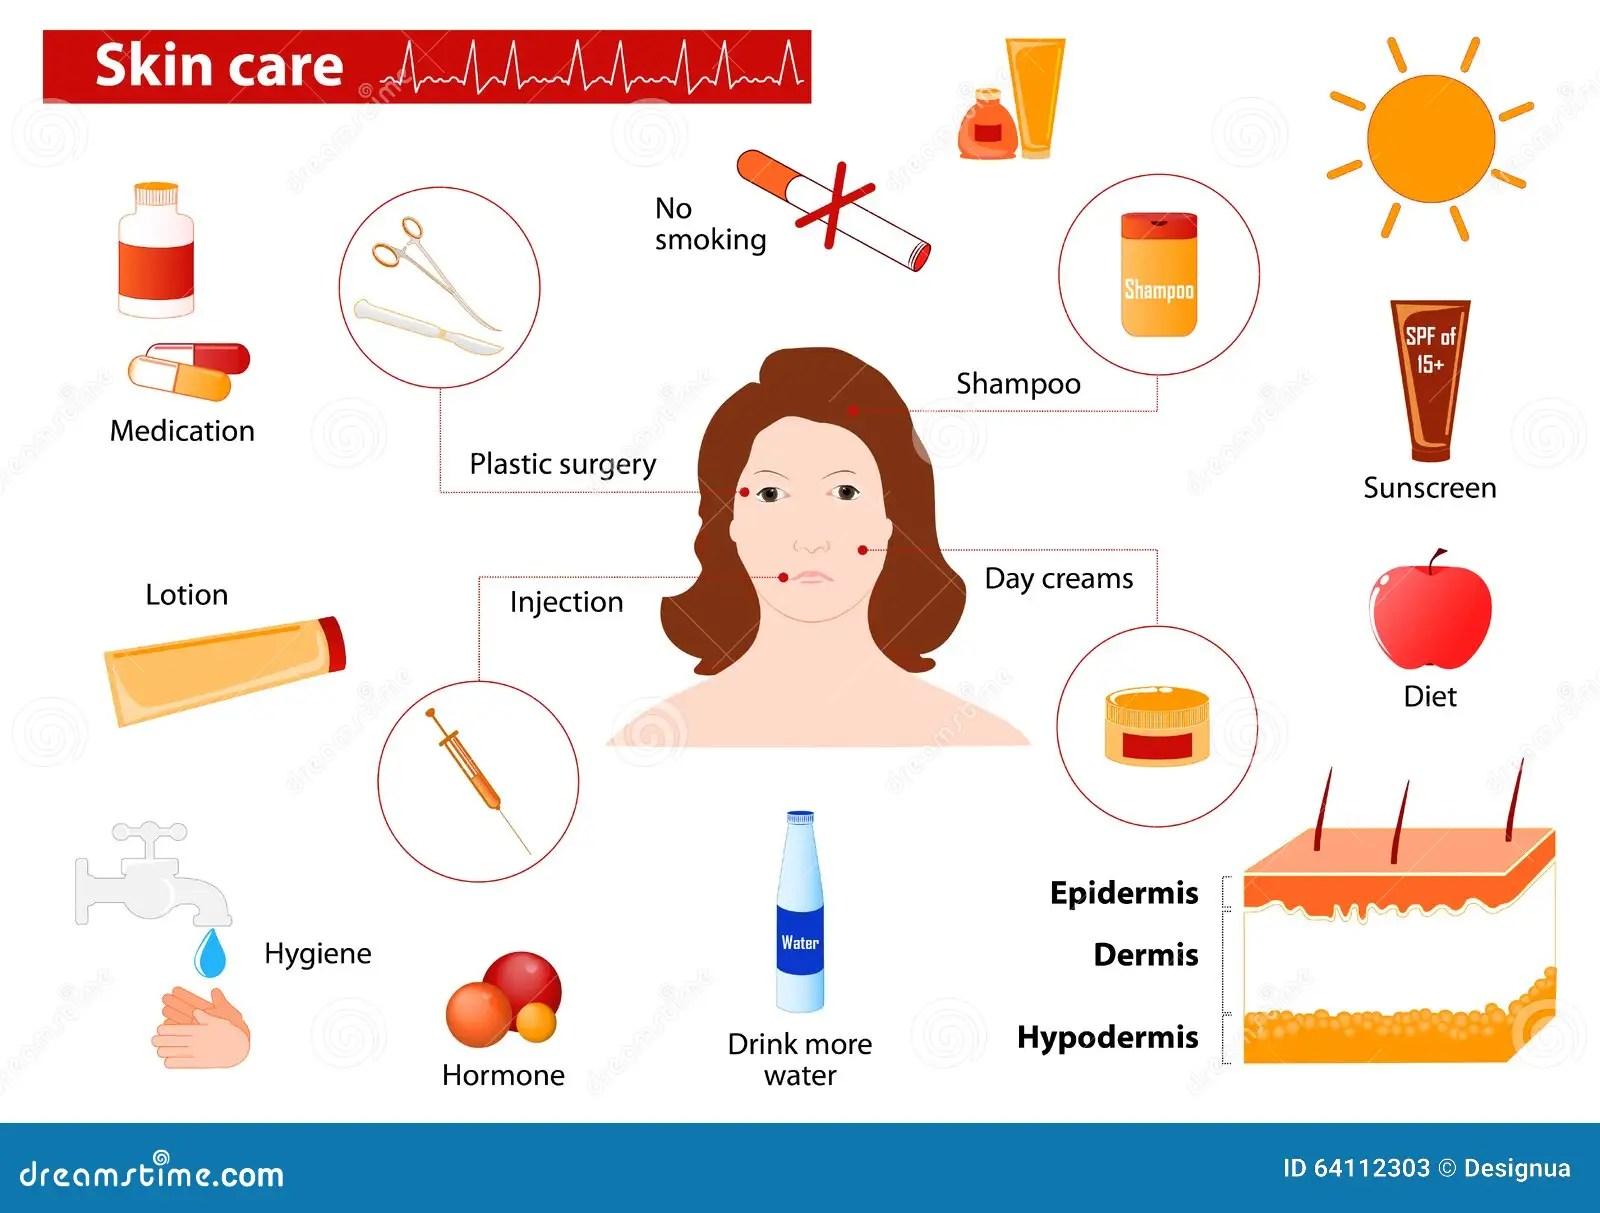 Symbols In Health Care Settings